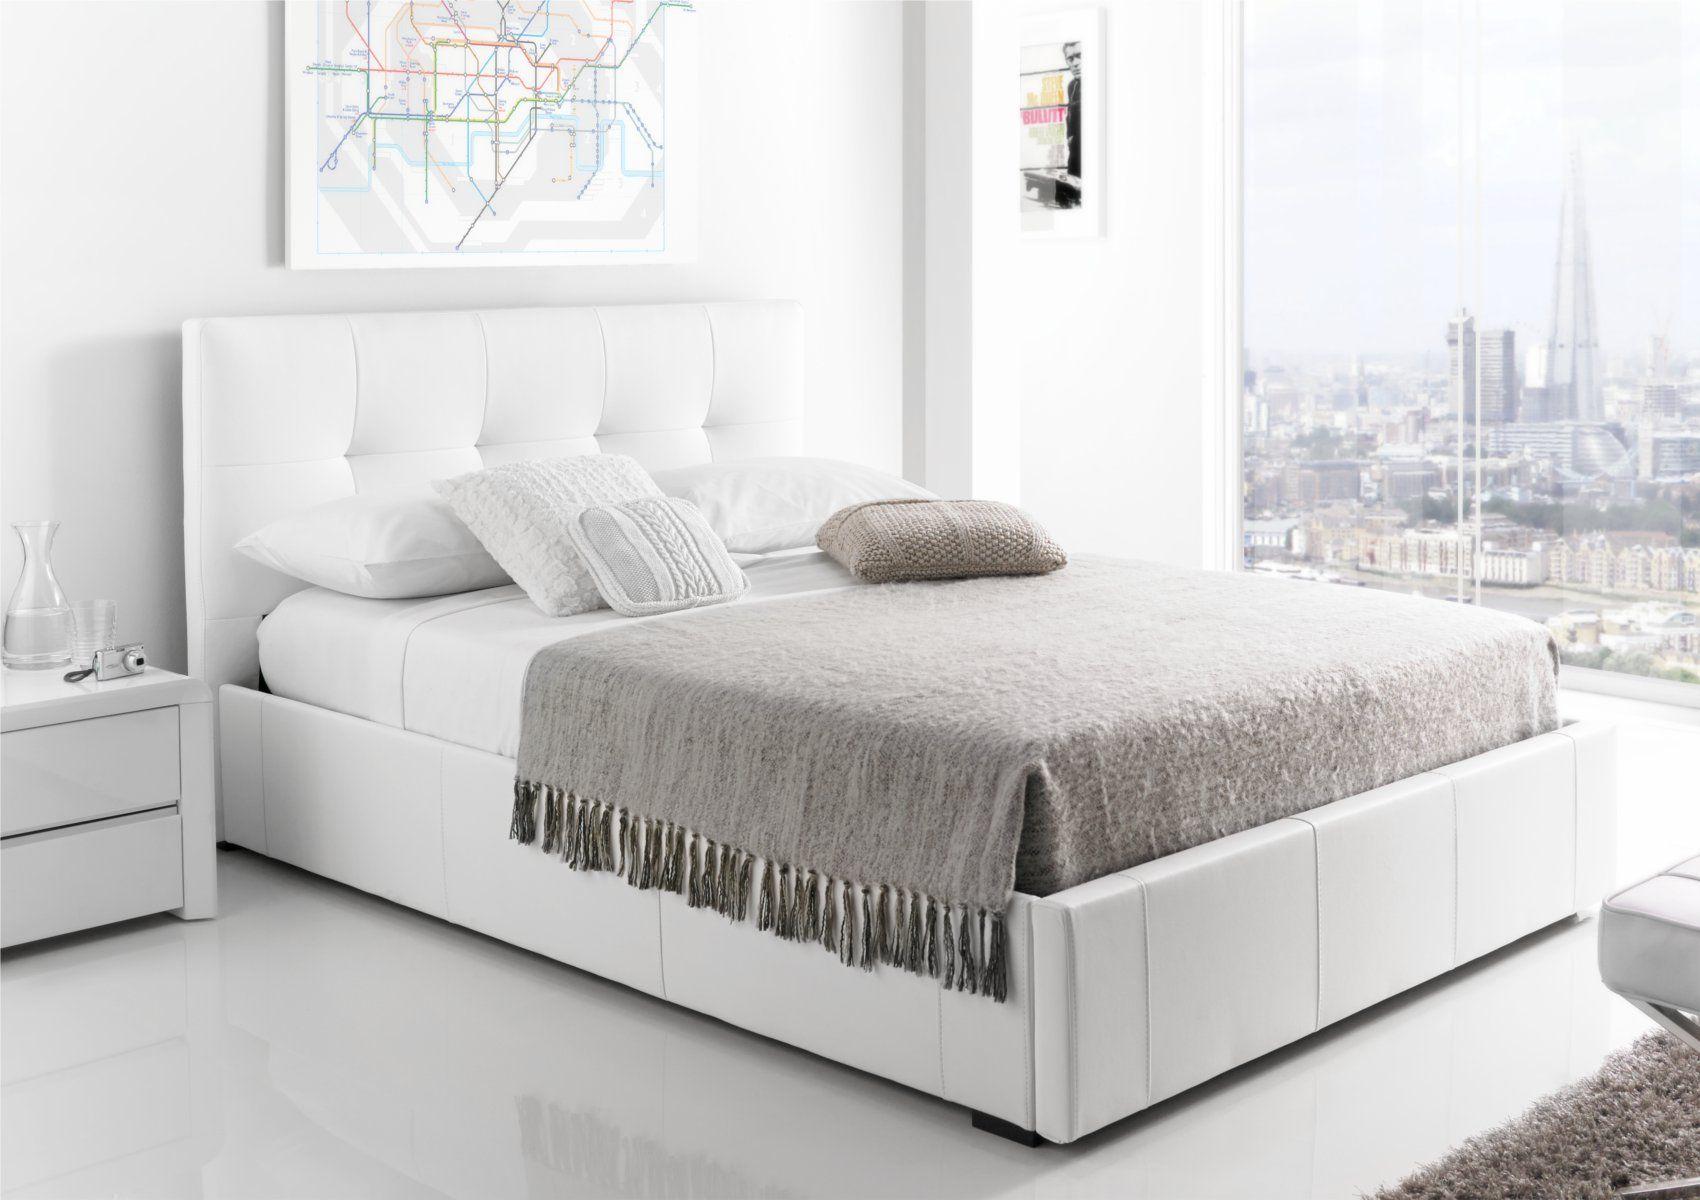 ... Storage Drawer Bed - White Leather £279 //.time4sleep.co.uk/beds/storage-beds/kaydian-hexham-upholstered- storage-drawer-bed-white-leather & Kaydian Hexham Upholstered Storage Drawer Bed - White Leather £279 ...